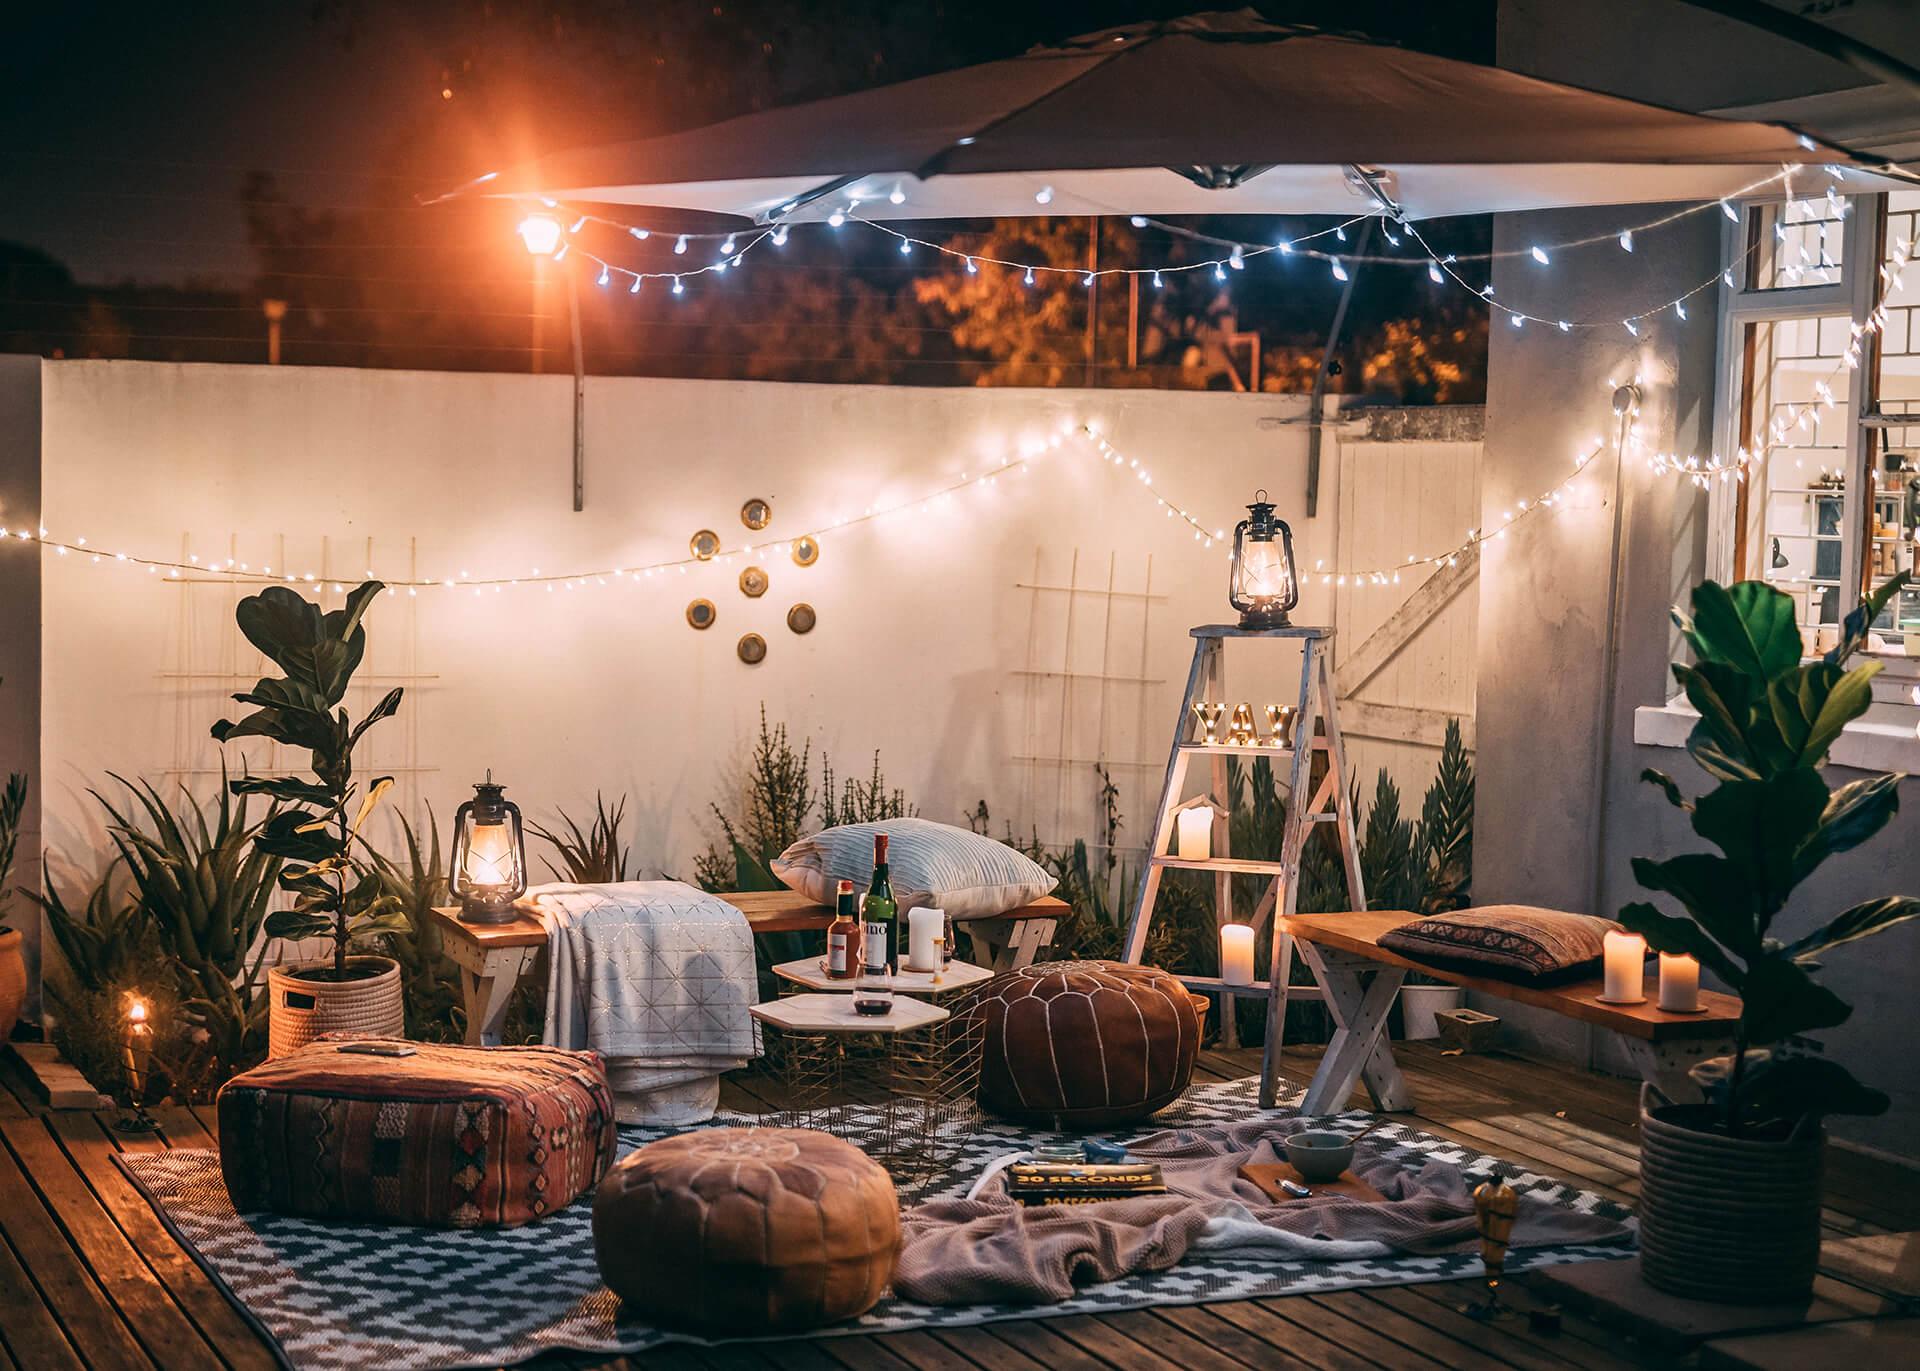 romantic picnic date ideas for a backyard